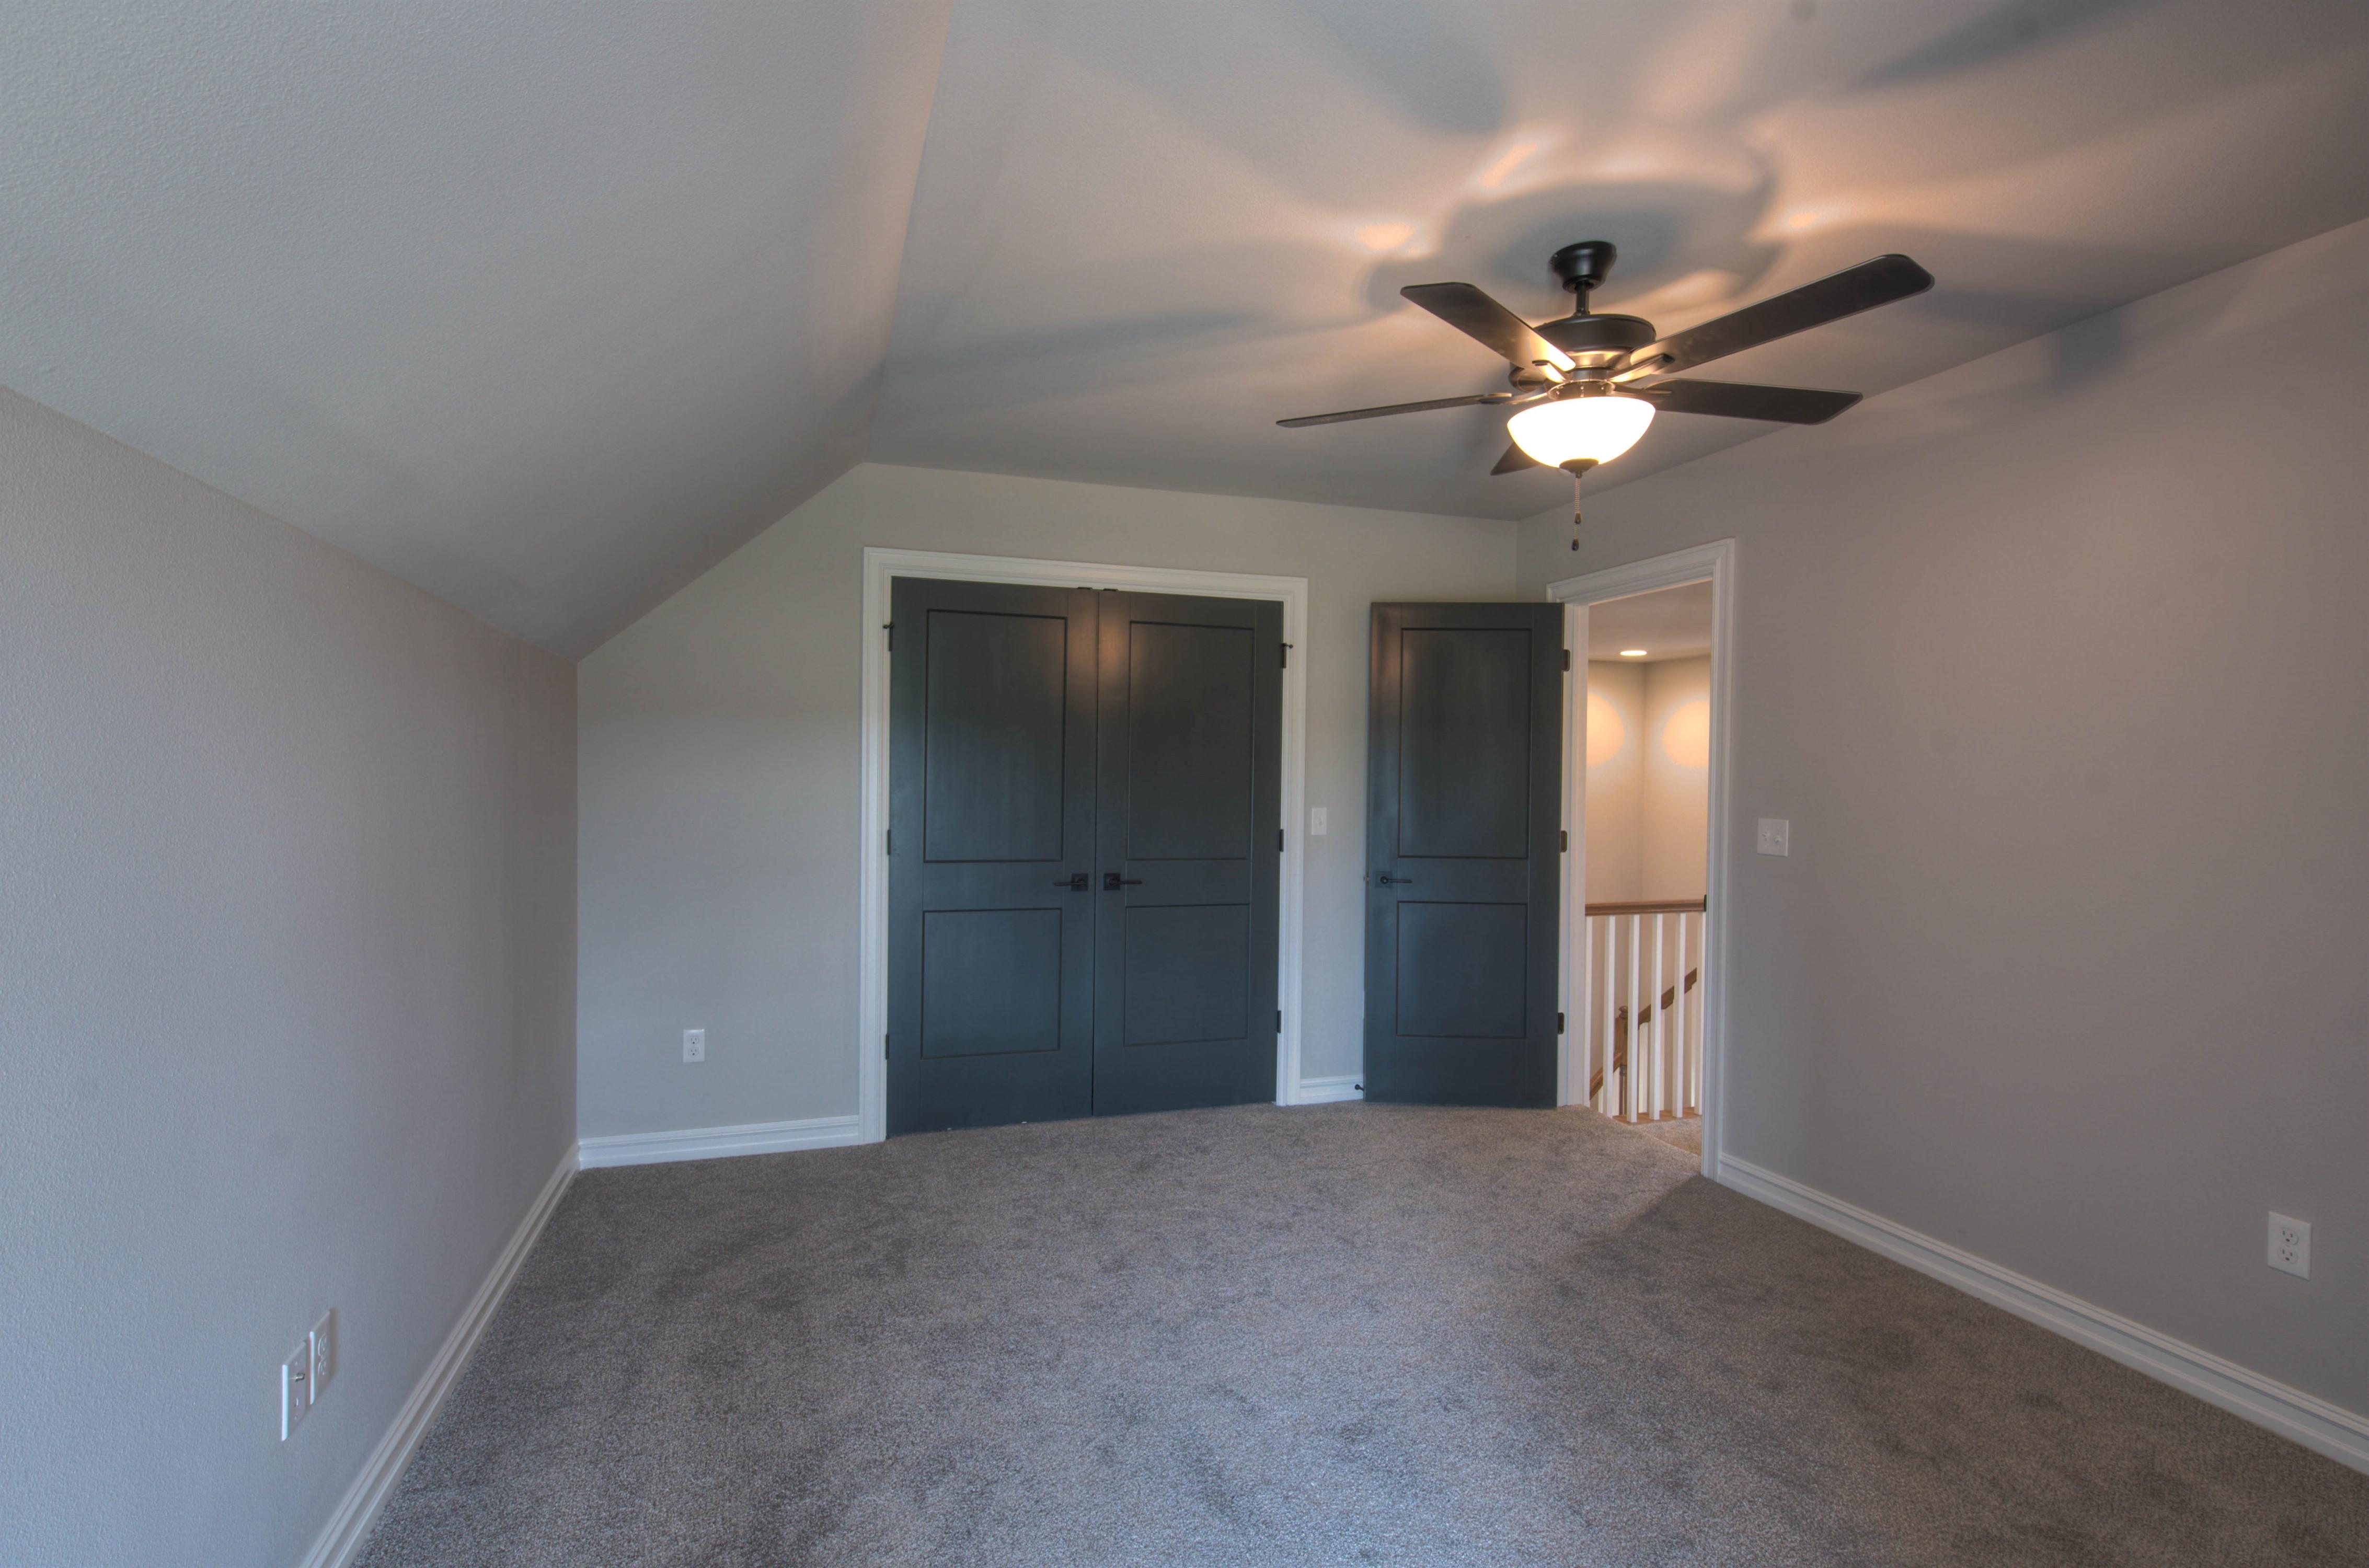 15850 E 107th Street North Property Photo 29